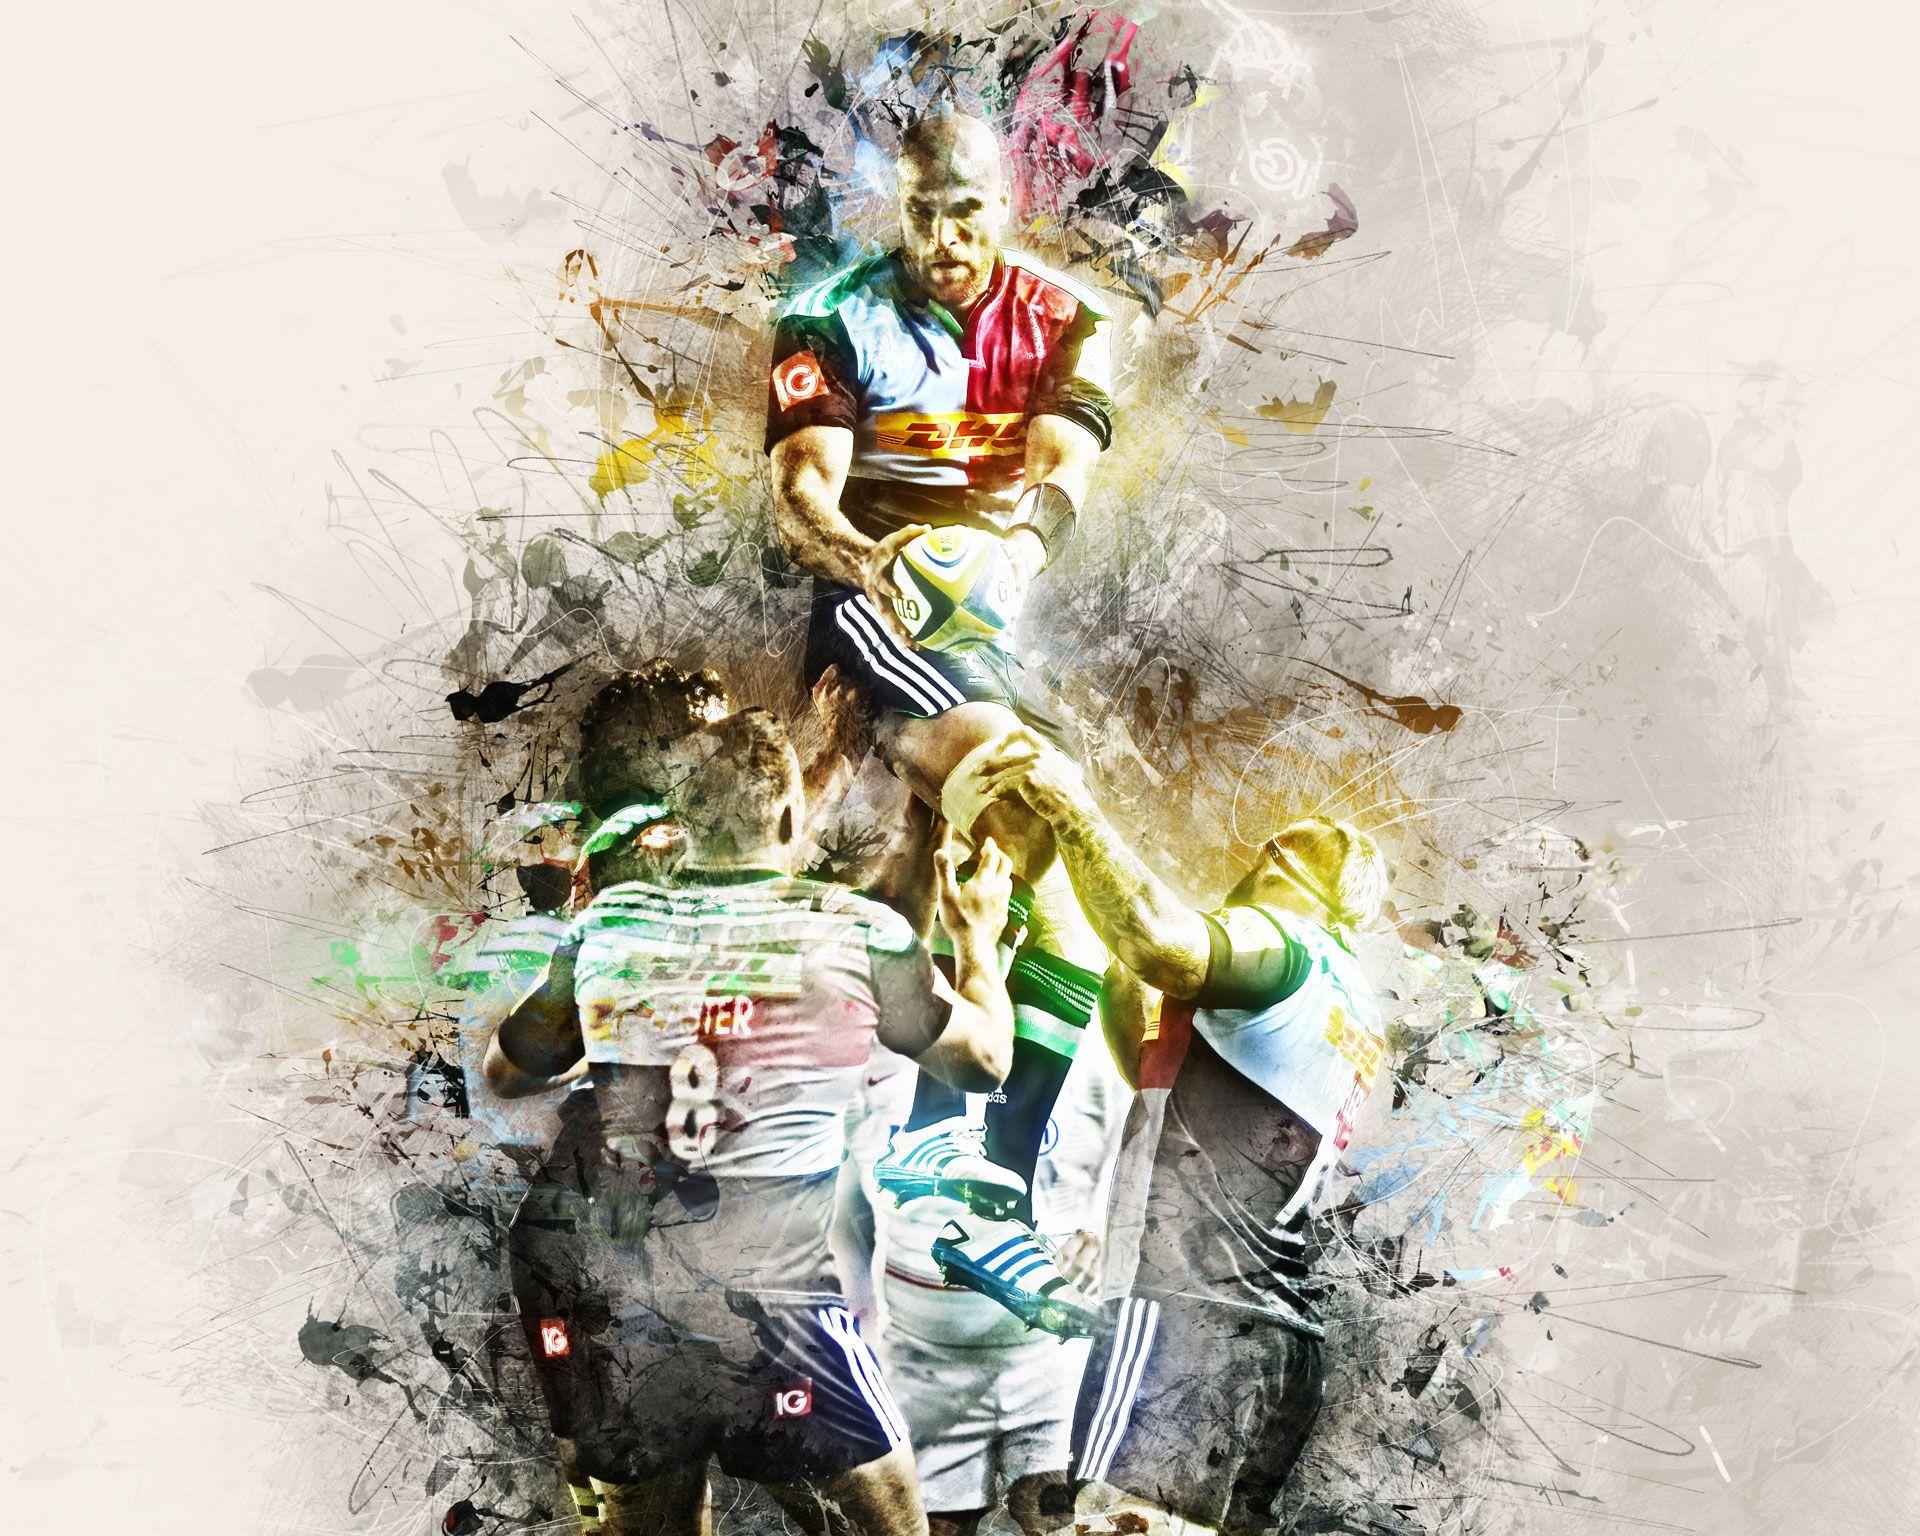 Harlequins Rugby Team Strategic Plan Visual Concept Digital Artwork Savanidis Stelios Rugby Art South Africa Rugby Team Digital Artwork